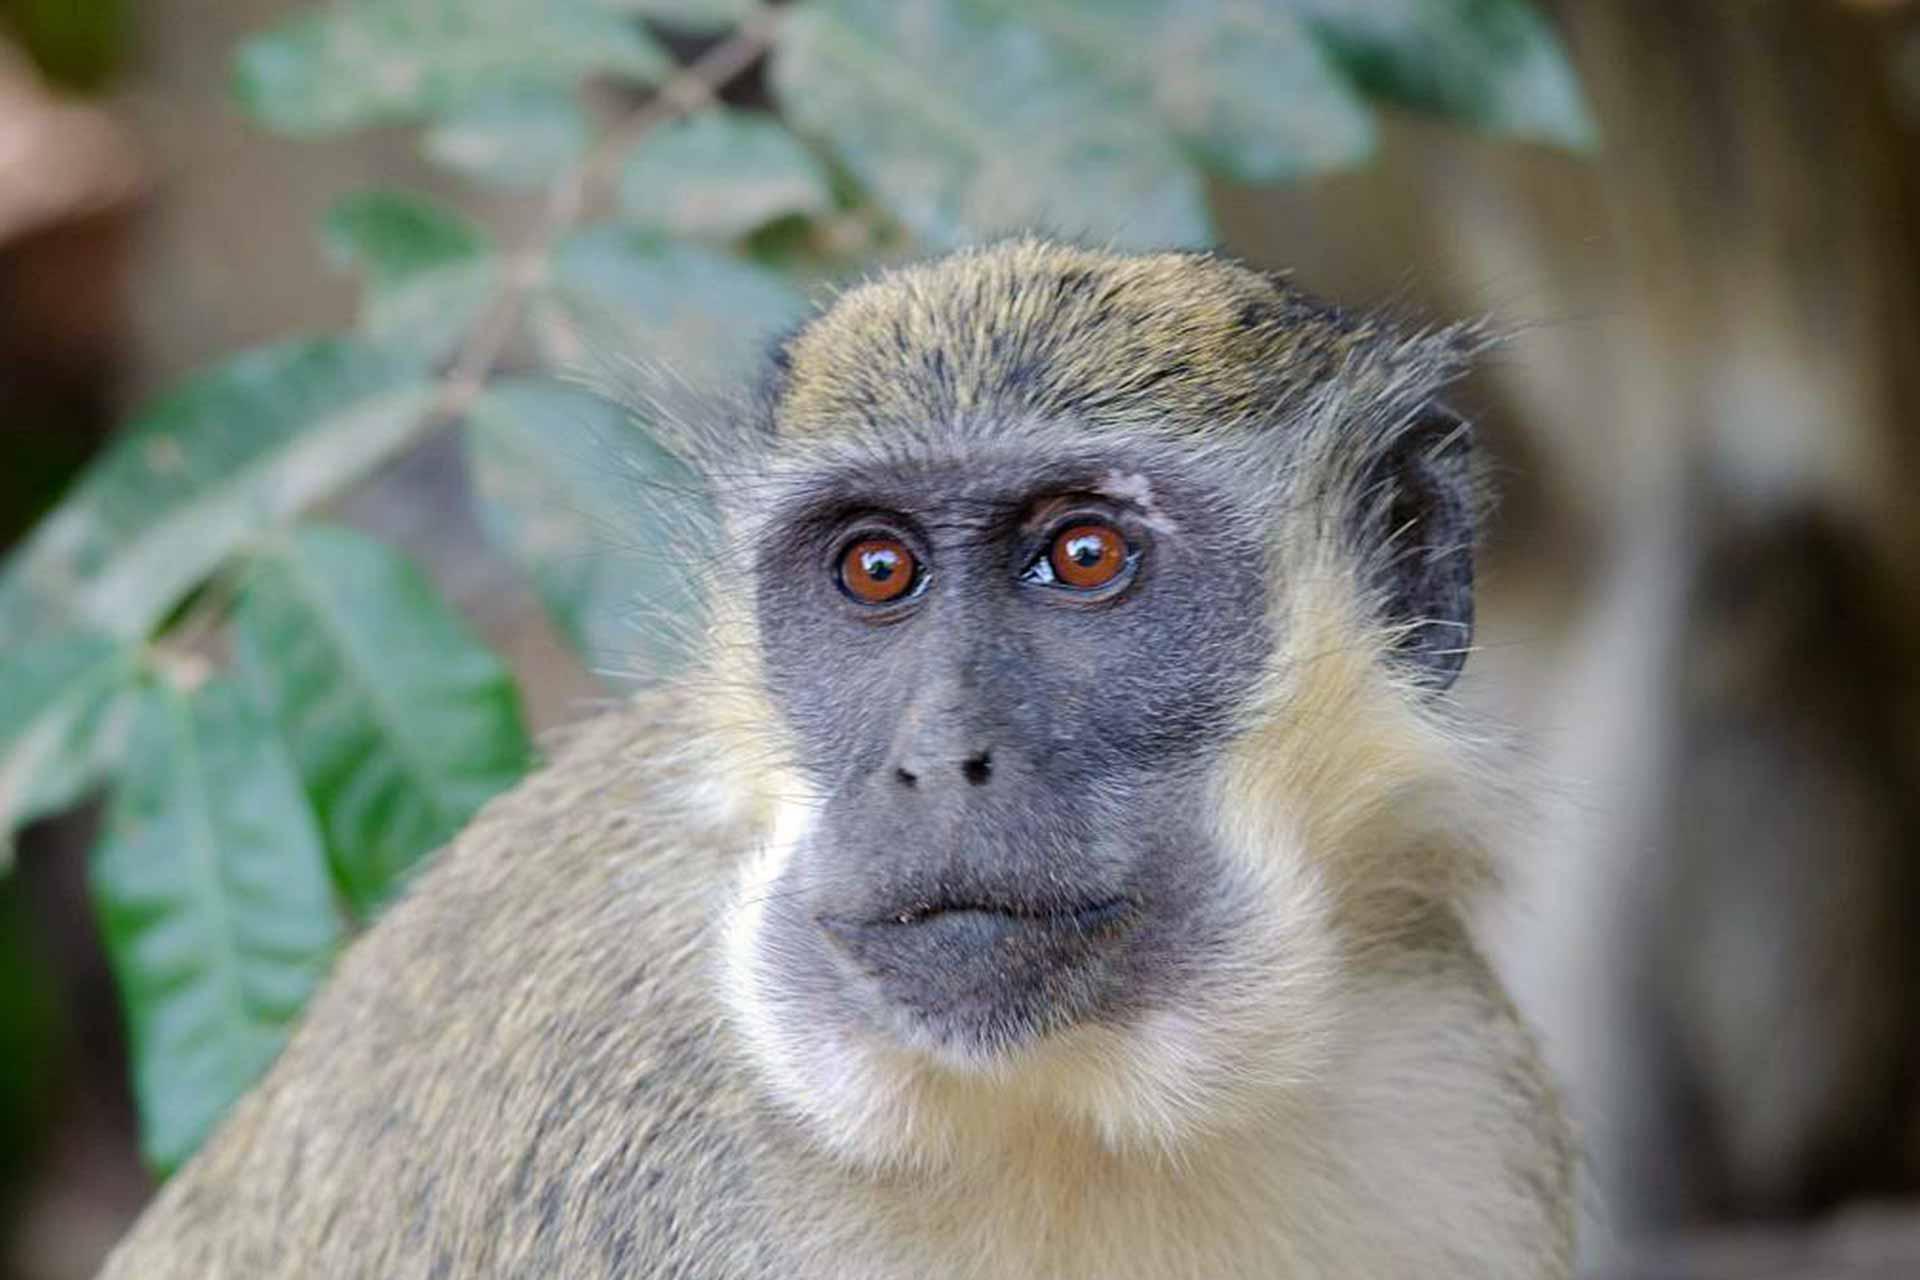 Visit Abuko Nature Reserve & see monkeys